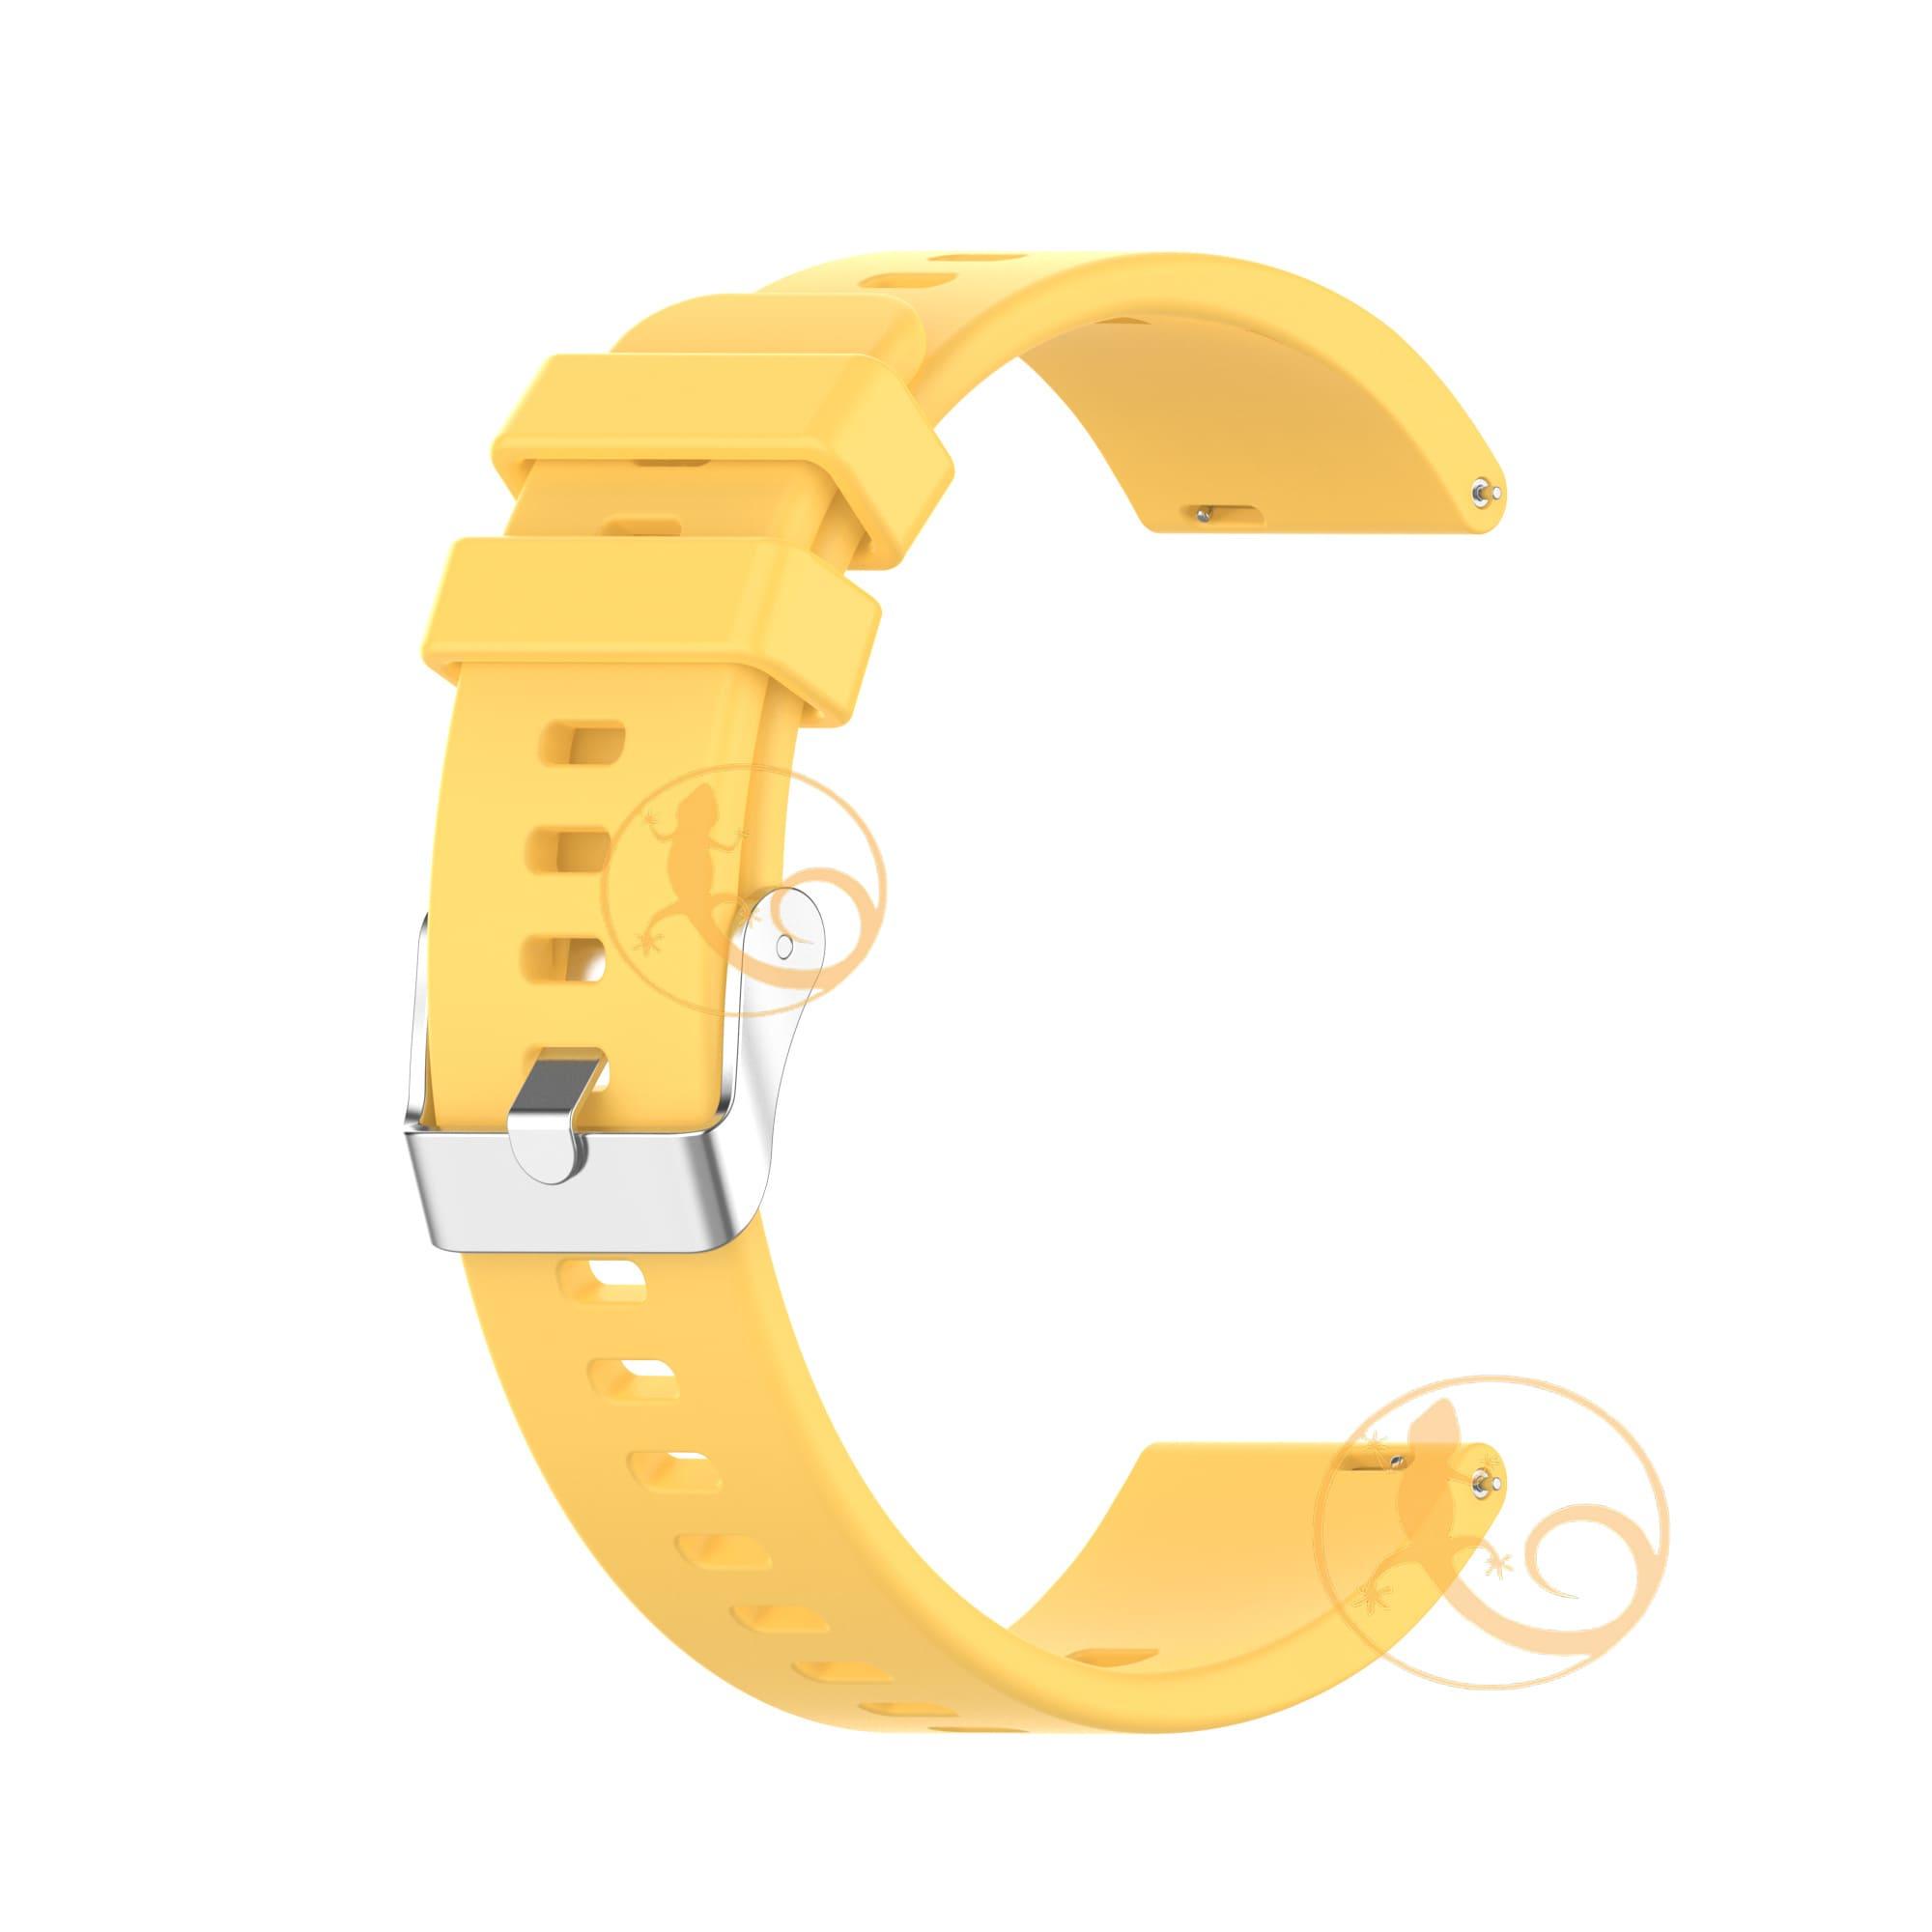 بند s3 frontier زرد